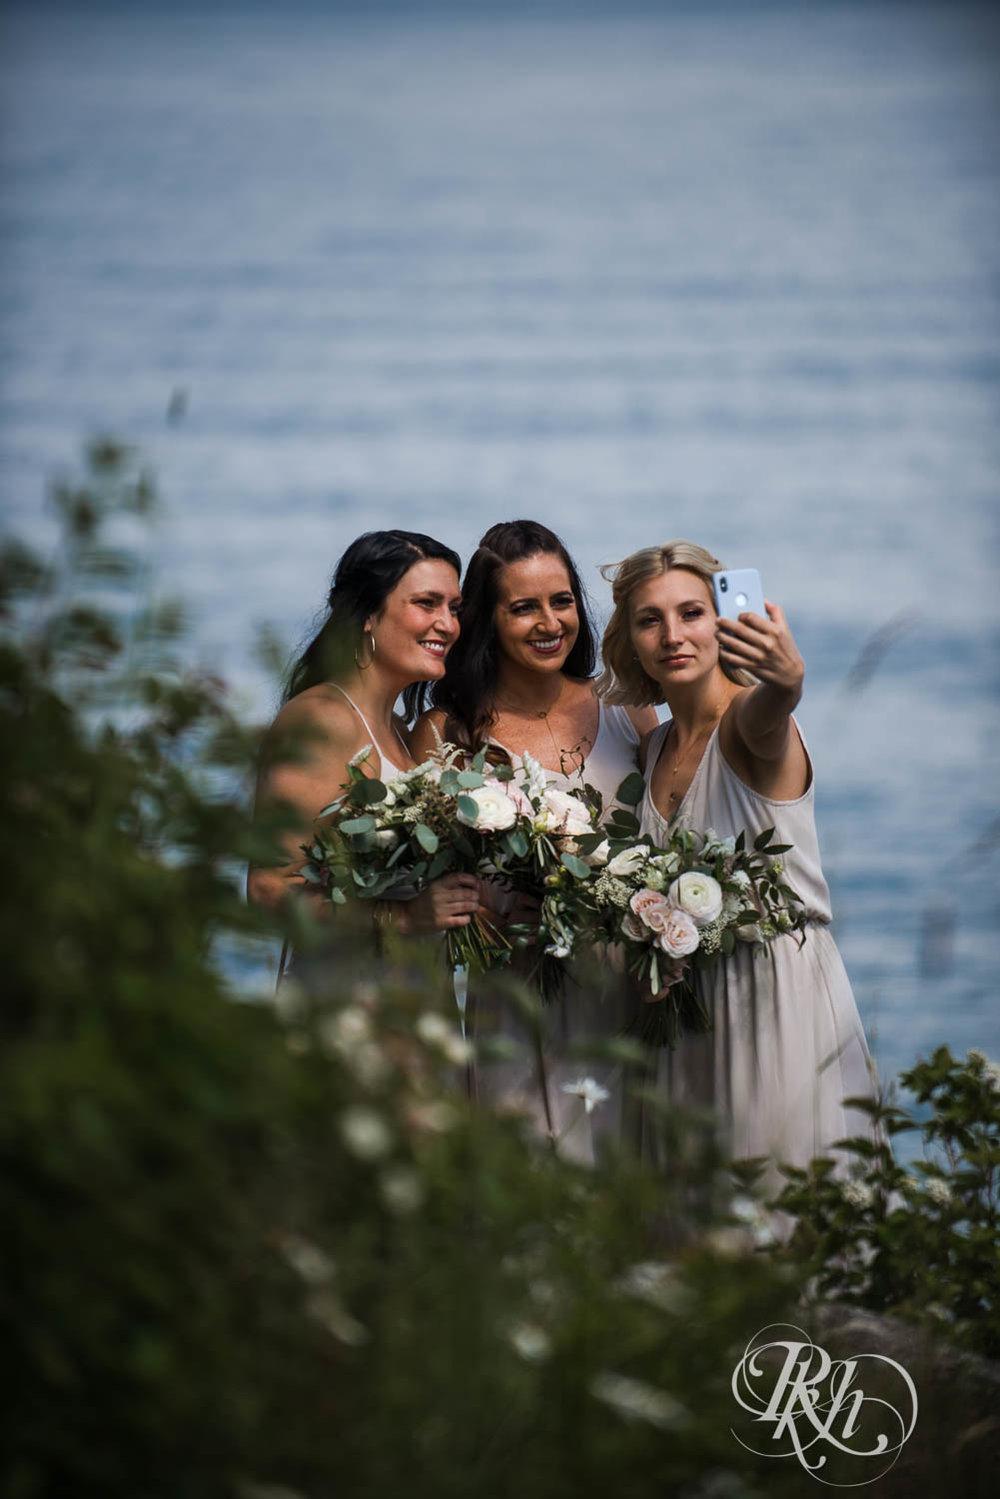 Kayla & John - Minnesota Wedding Photography - North Shore Wedding Photography - Bluefin Bay - RKH Images   (25 of 55).jpg